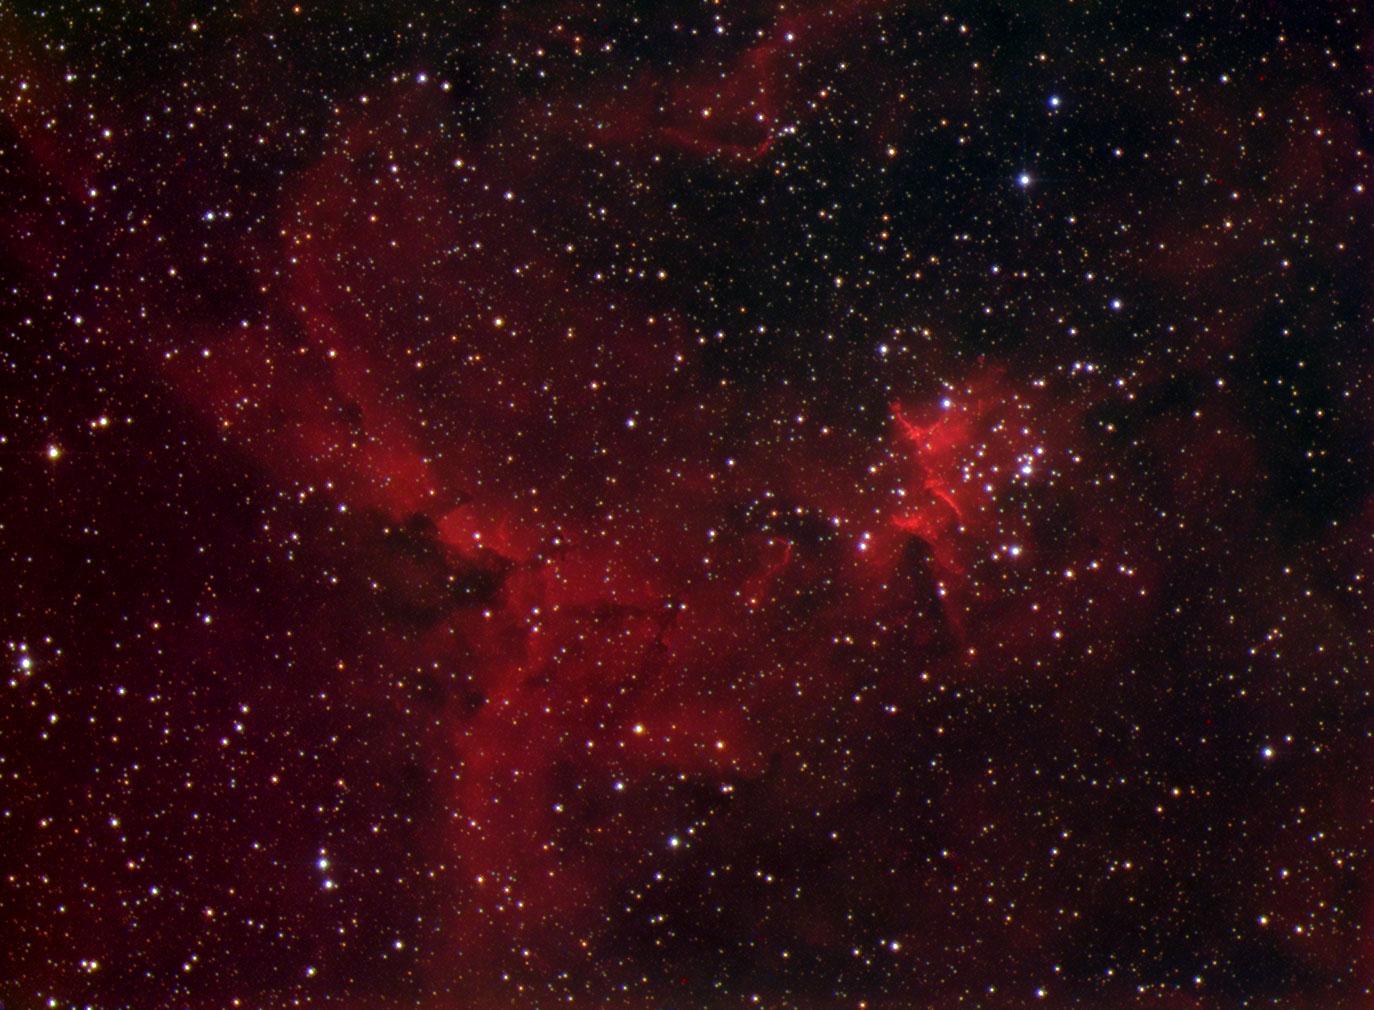 IC1805 - The Heart nebula